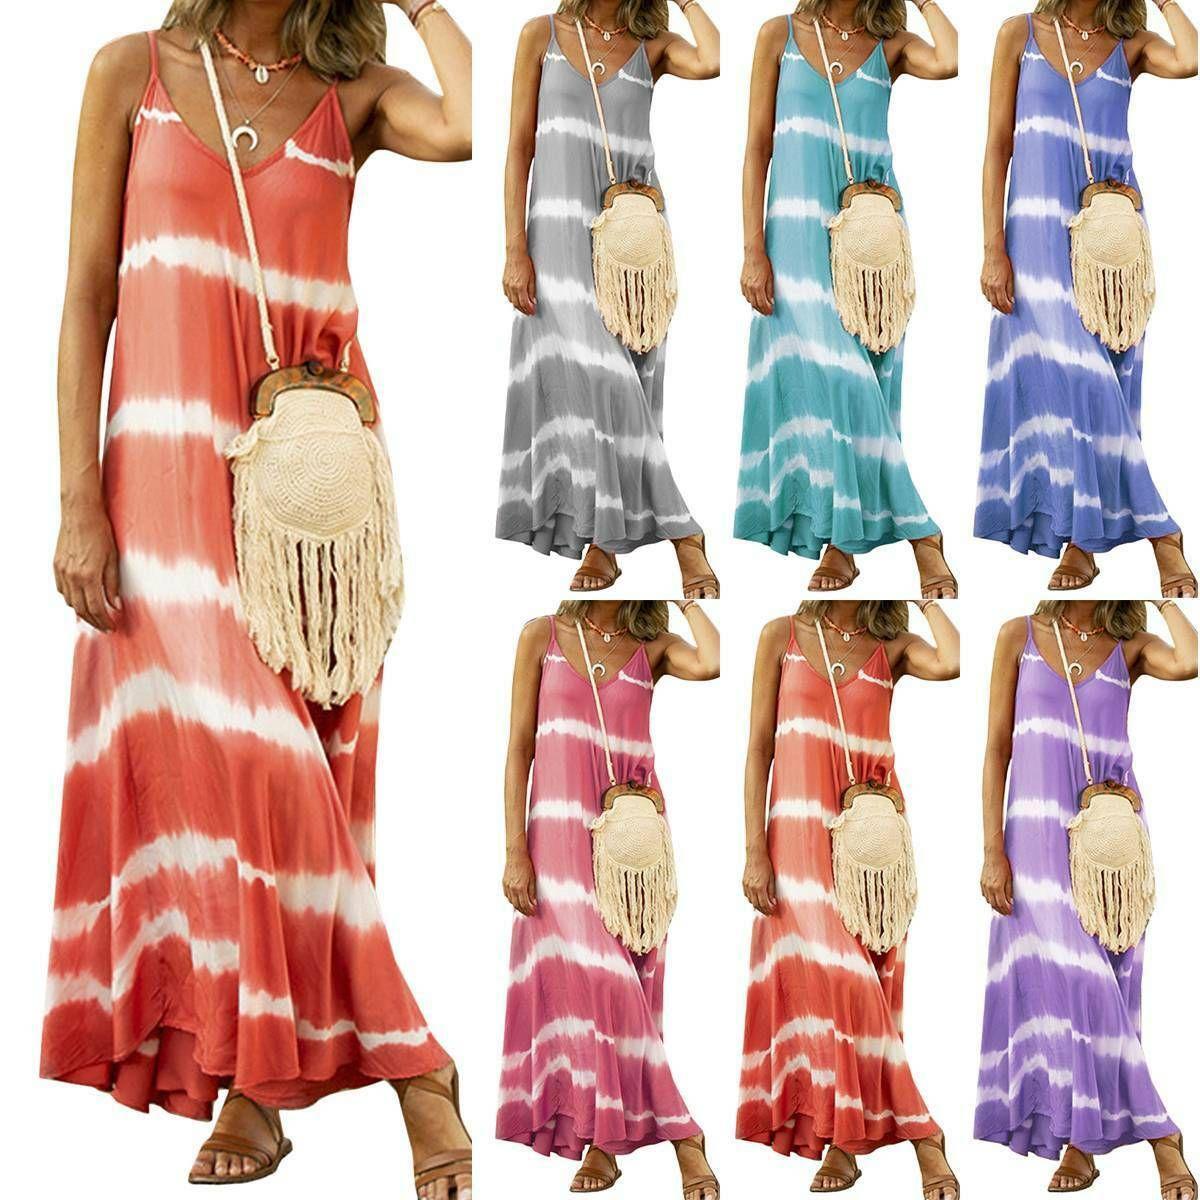 damen tie dye sommer lose maxikleid strandkleid partykleid